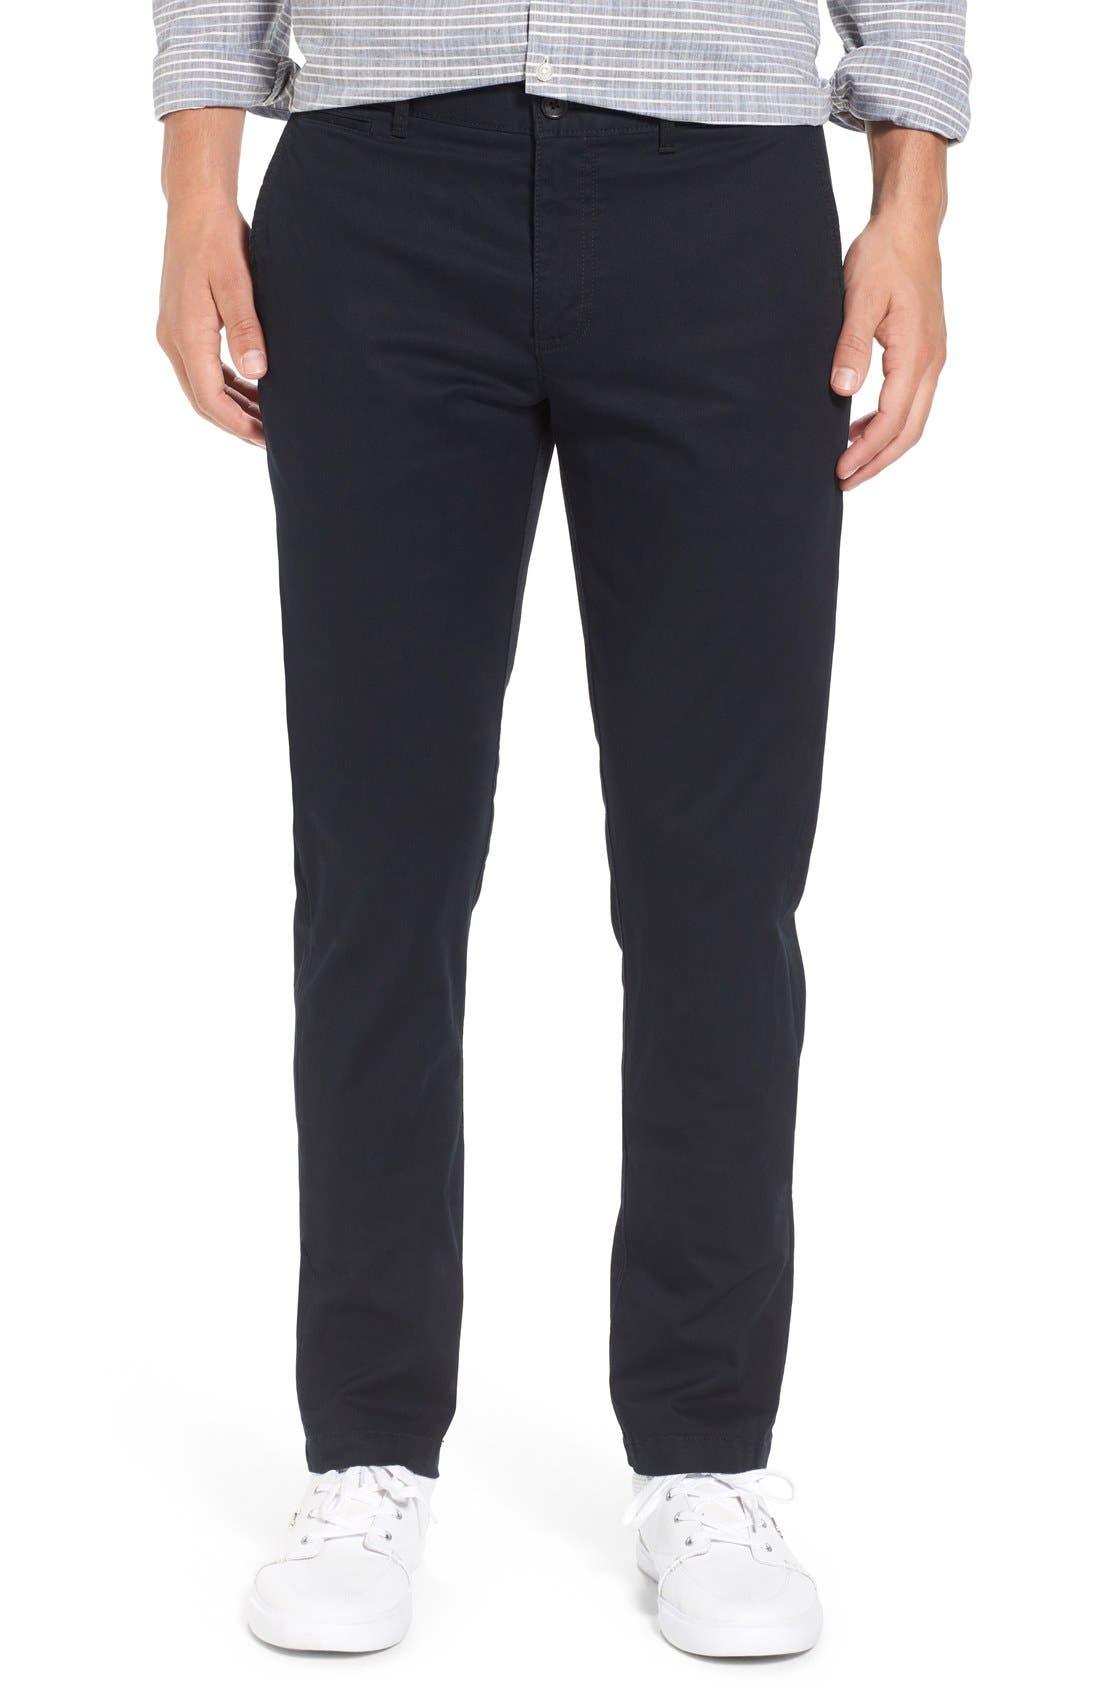 Original Penguin '955' Bedford Corduroy Pants